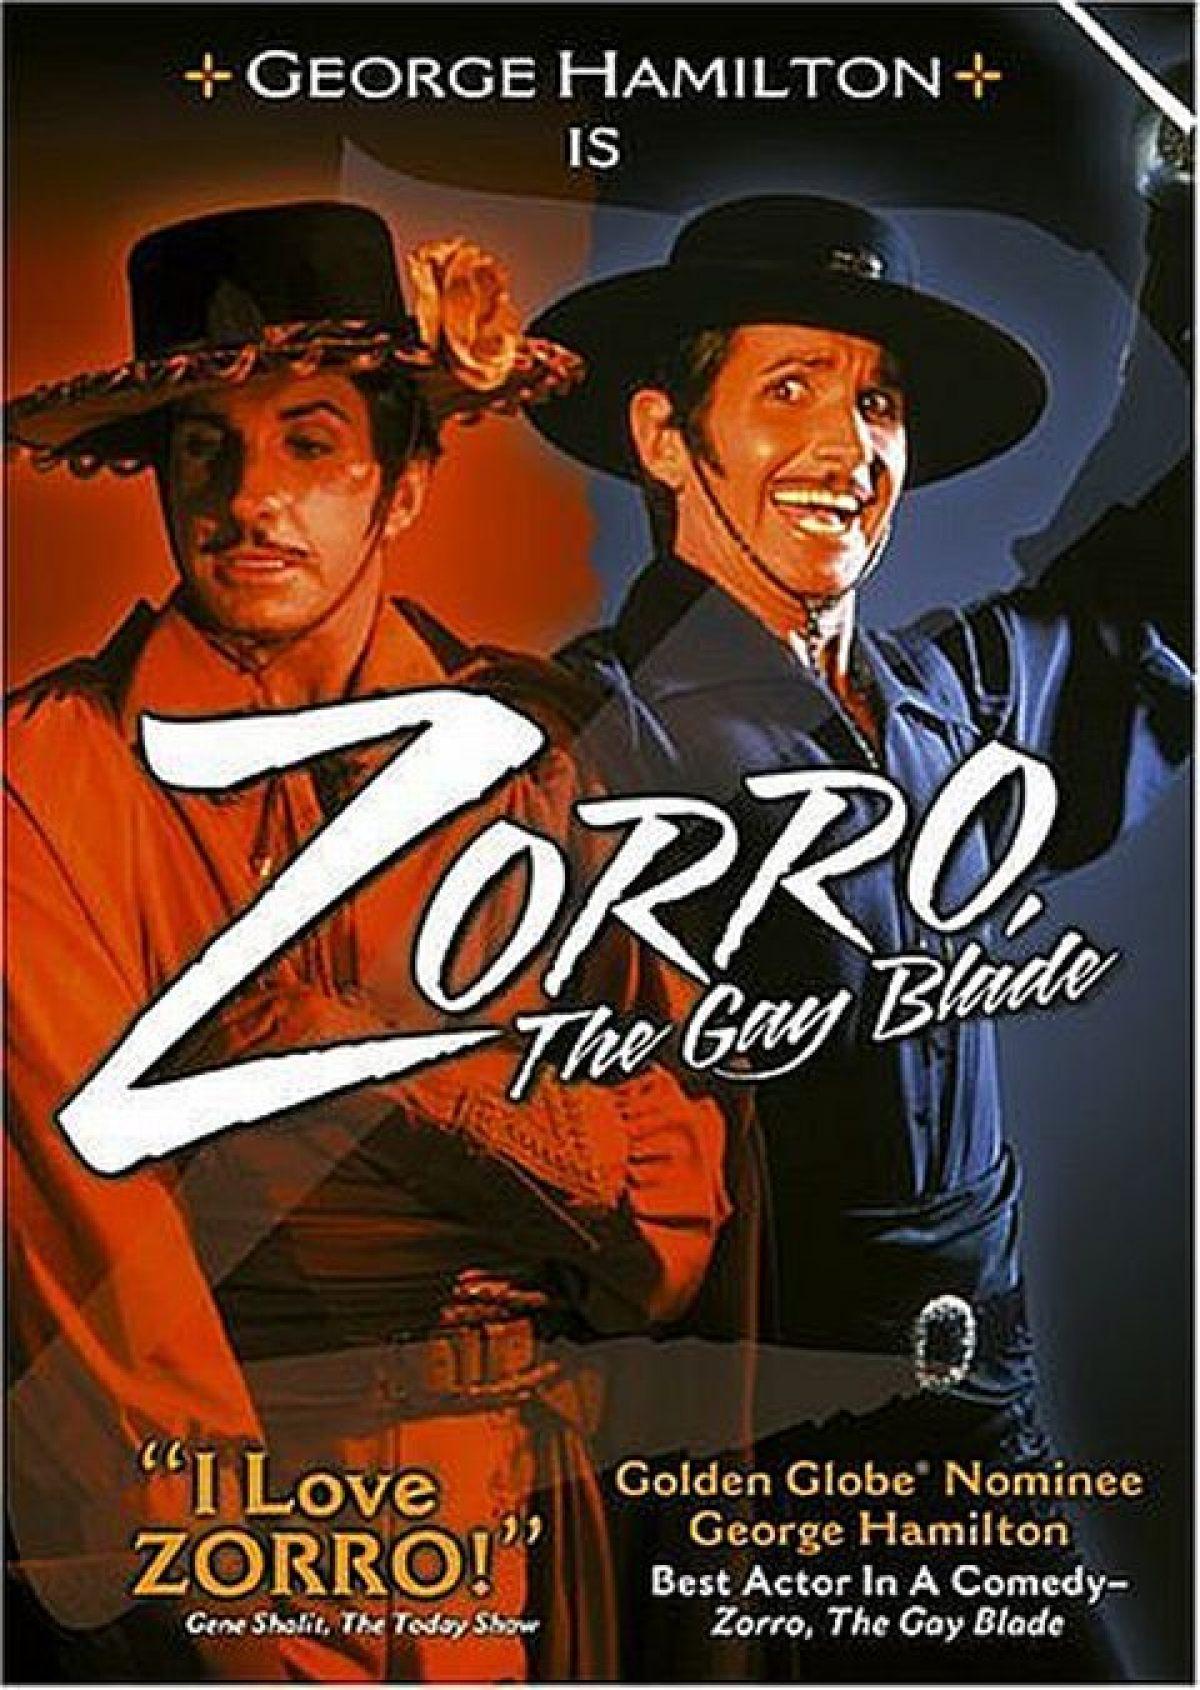 Zorro The Gay Blade Trailer 15